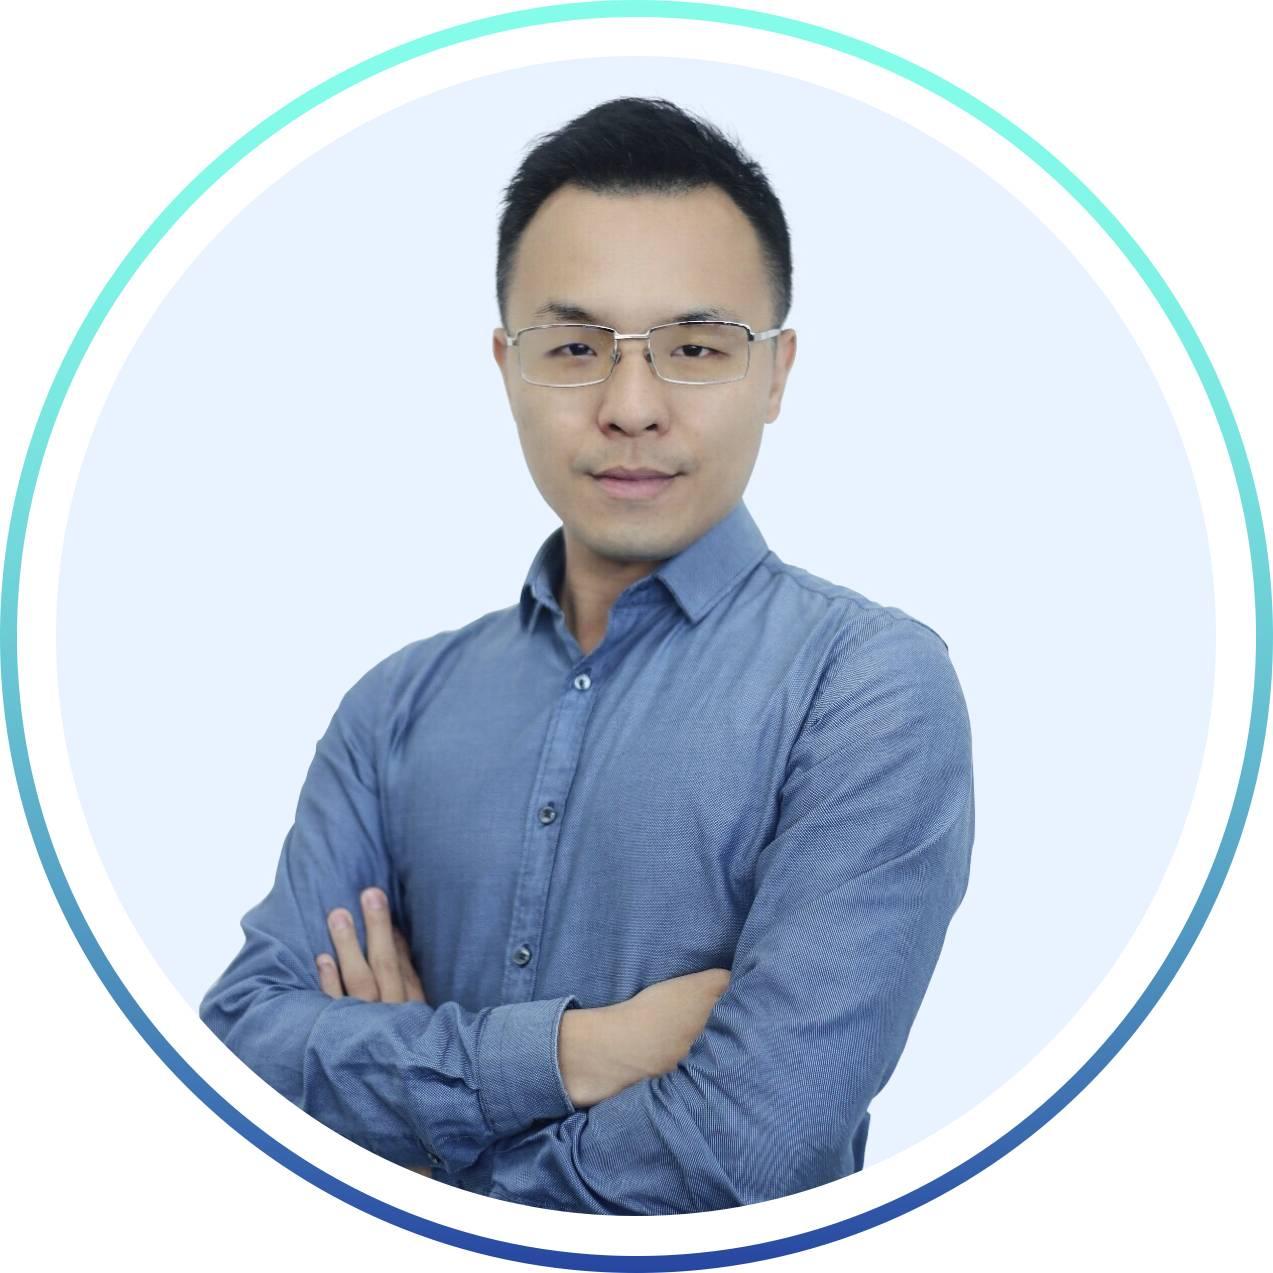 陈万峰.png